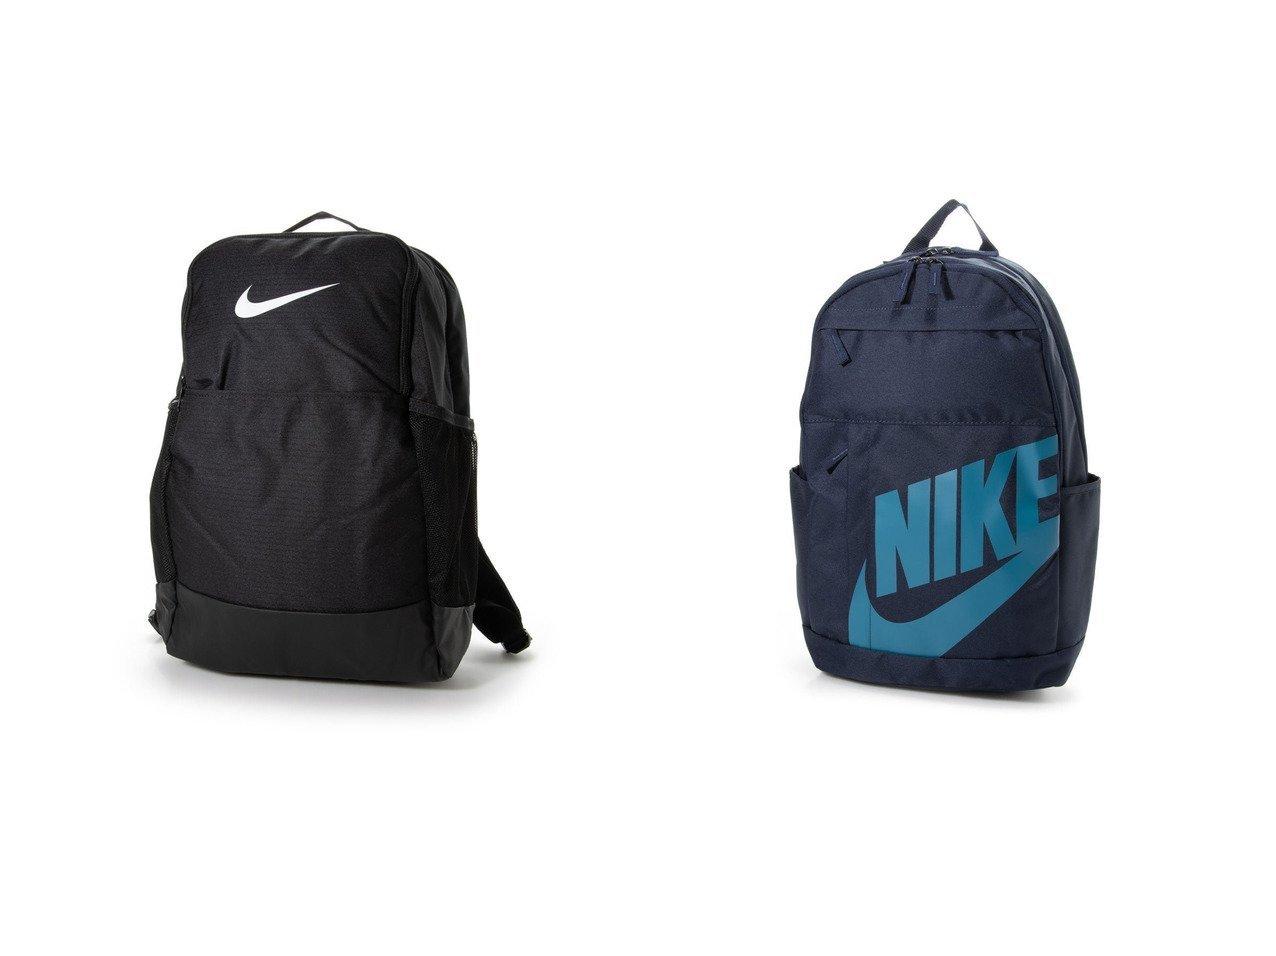 【NIKE/ナイキ】のデイパック ナイキ ブラジリア バックパック M BA5954010&デイパック ナイキ エレメンタル バックパック BA5876453 バッグ・鞄のおすすめ!人気、トレンド・レディースファッションの通販 おすすめで人気の流行・トレンド、ファッションの通販商品 メンズファッション・キッズファッション・インテリア・家具・レディースファッション・服の通販 founy(ファニー) https://founy.com/ ファッション Fashion レディースファッション WOMEN バッグ Bag 2021年 2021 2021 春夏 S/S SS Spring/Summer 2021 S/S 春夏 SS Spring/Summer デイパック 春 Spring 財布 |ID:crp329100000014994